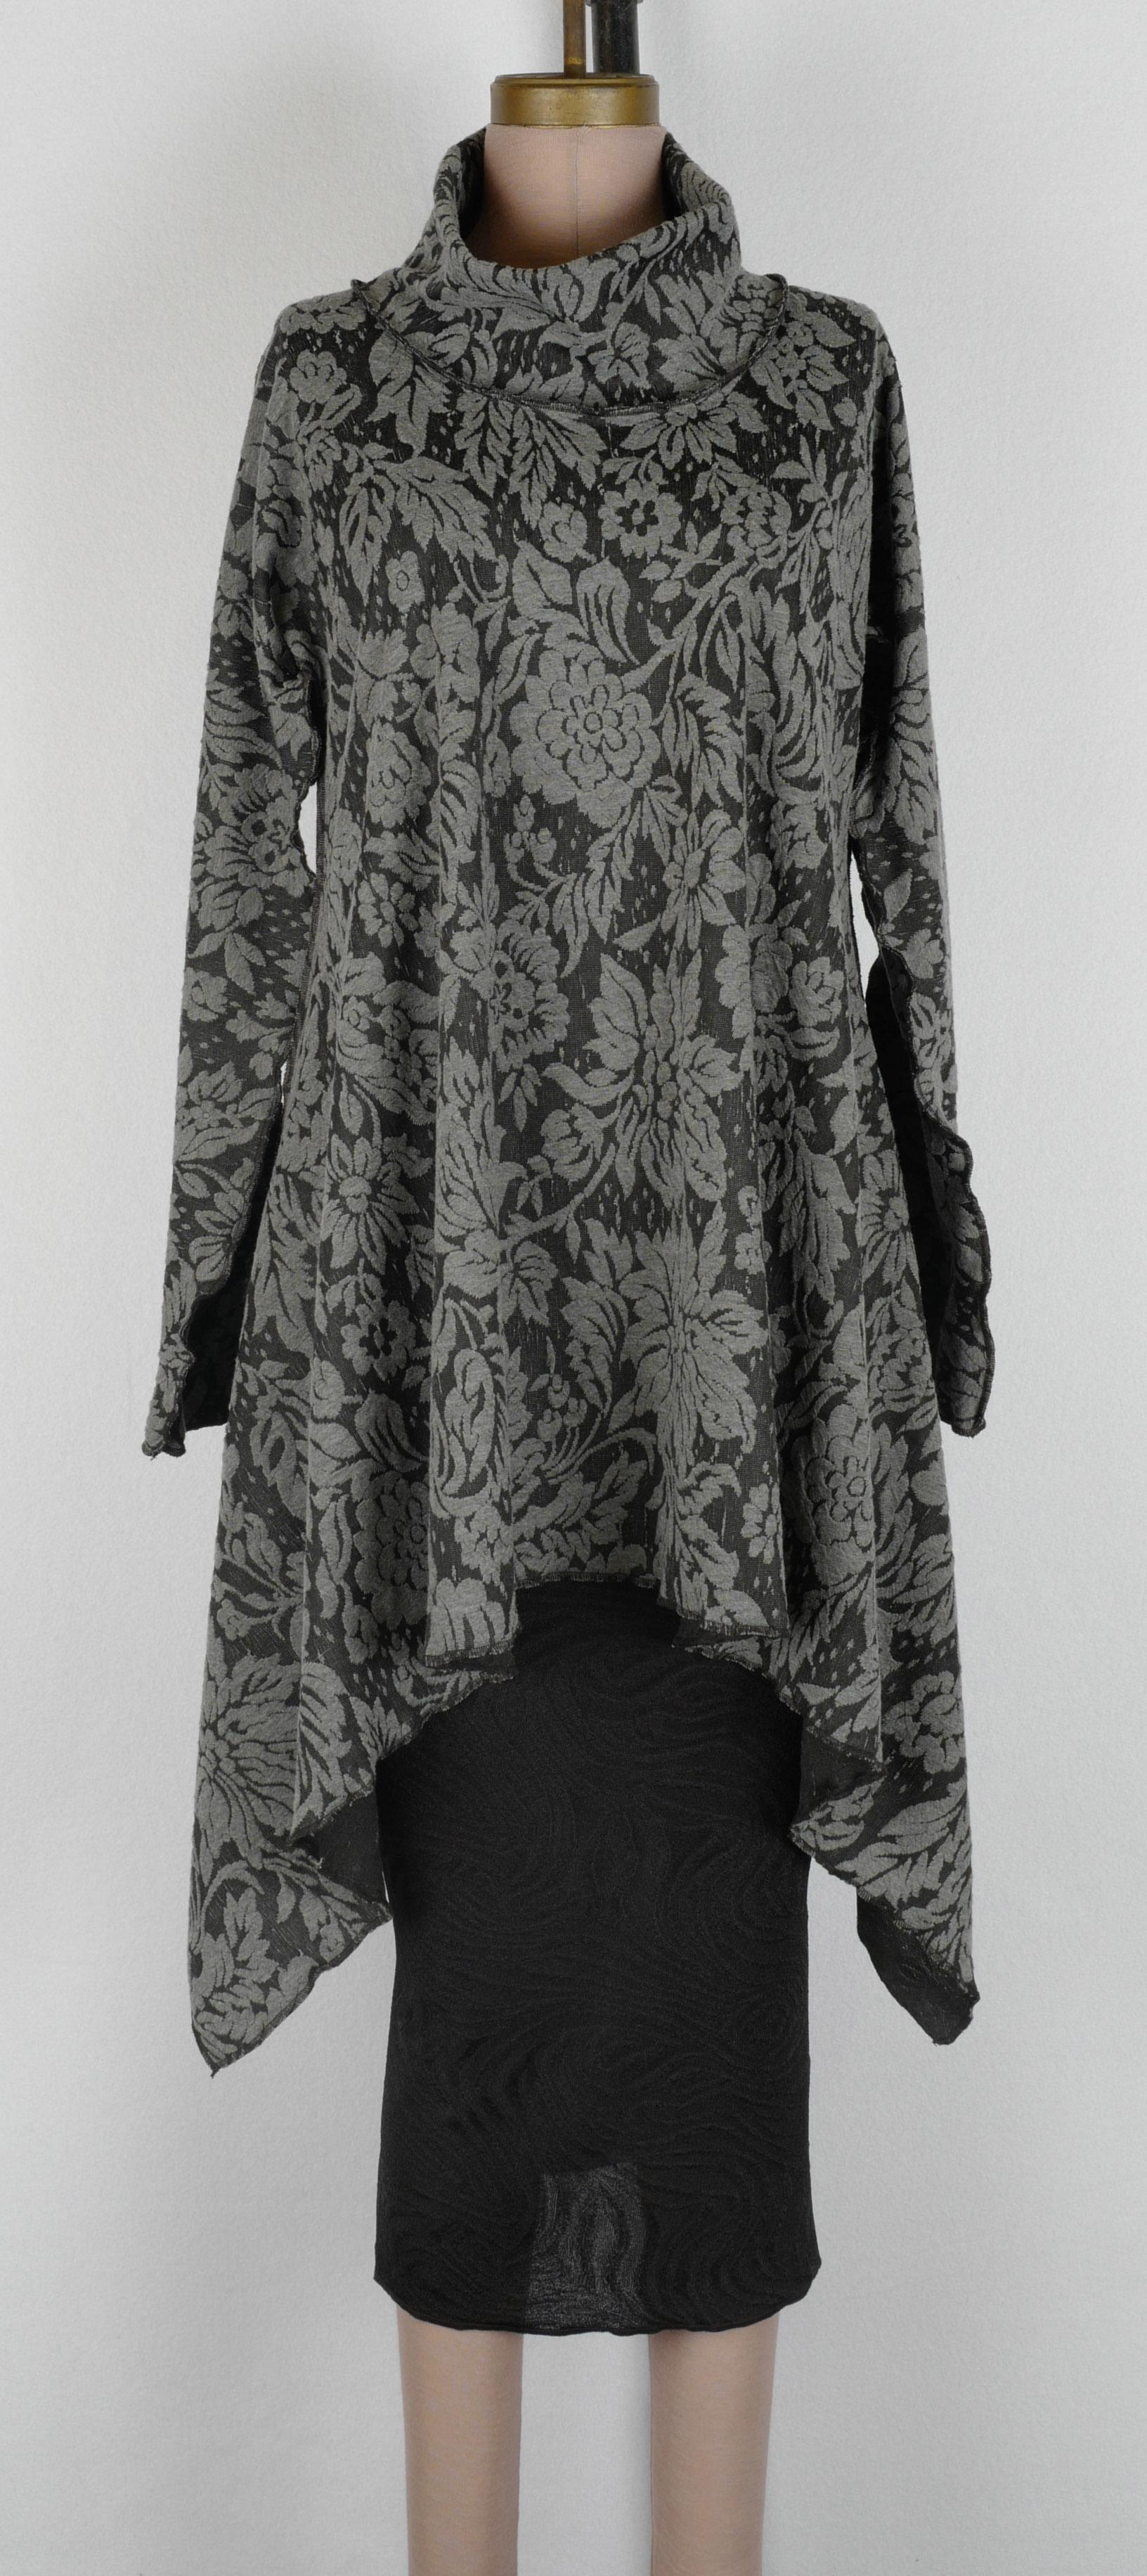 Cowl Arch Tunic $160 • S M L XL